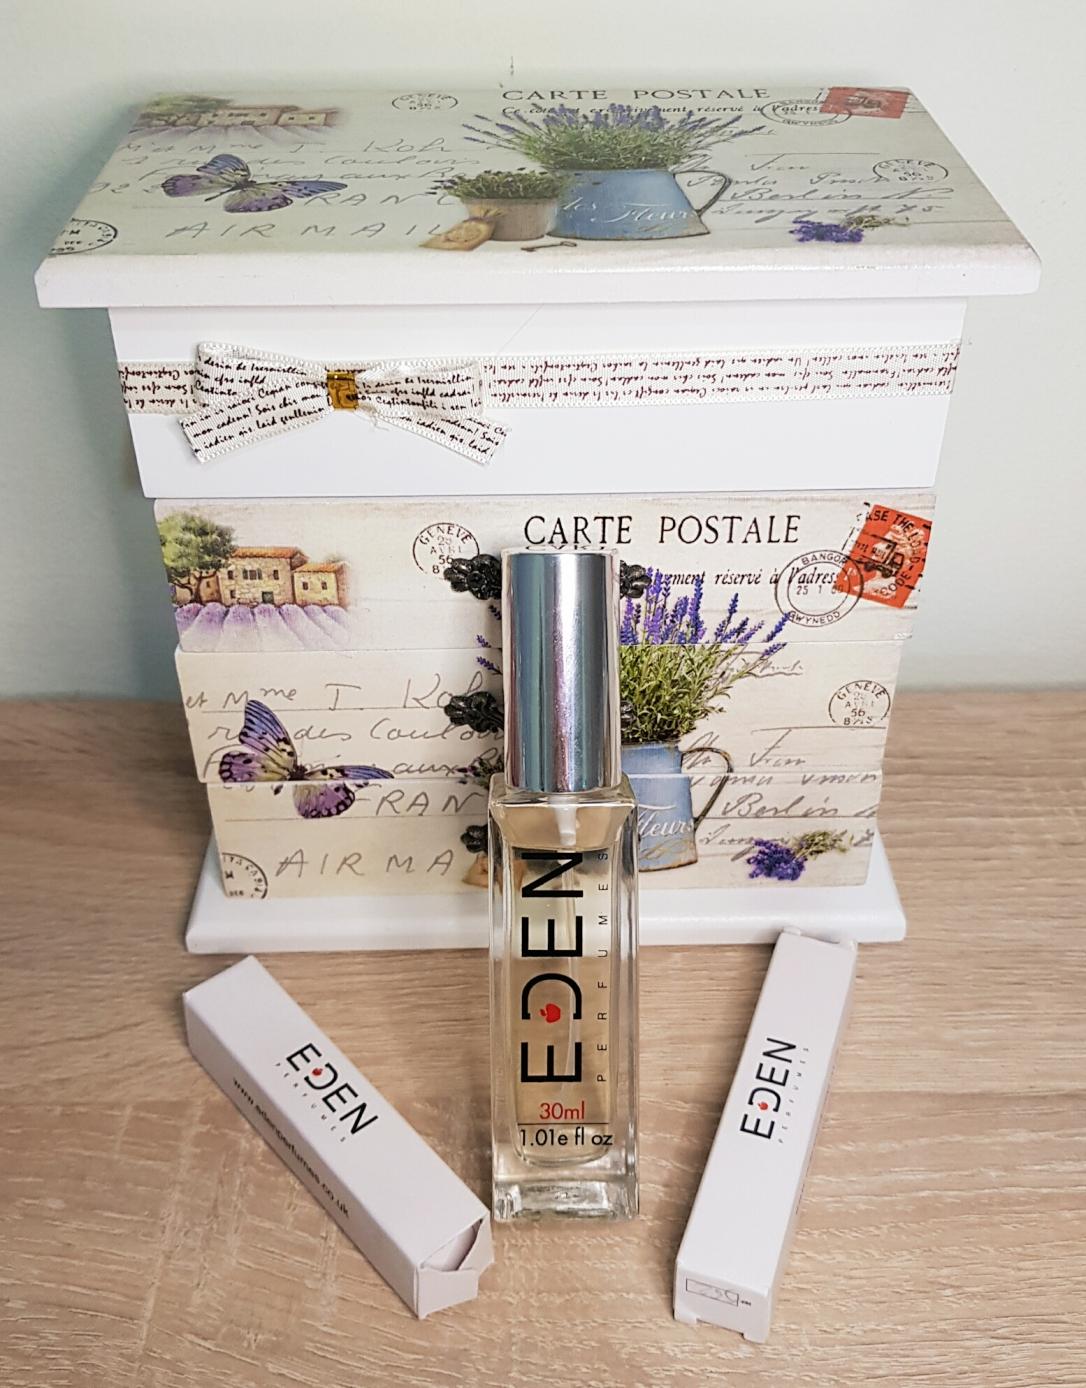 EDEN Perfumes variante etice, parfumuri vegane și cruelty-free, alternative vegane ale parfumurilor celebre Paco Rabbane Lancome Armani Guerlain Angel